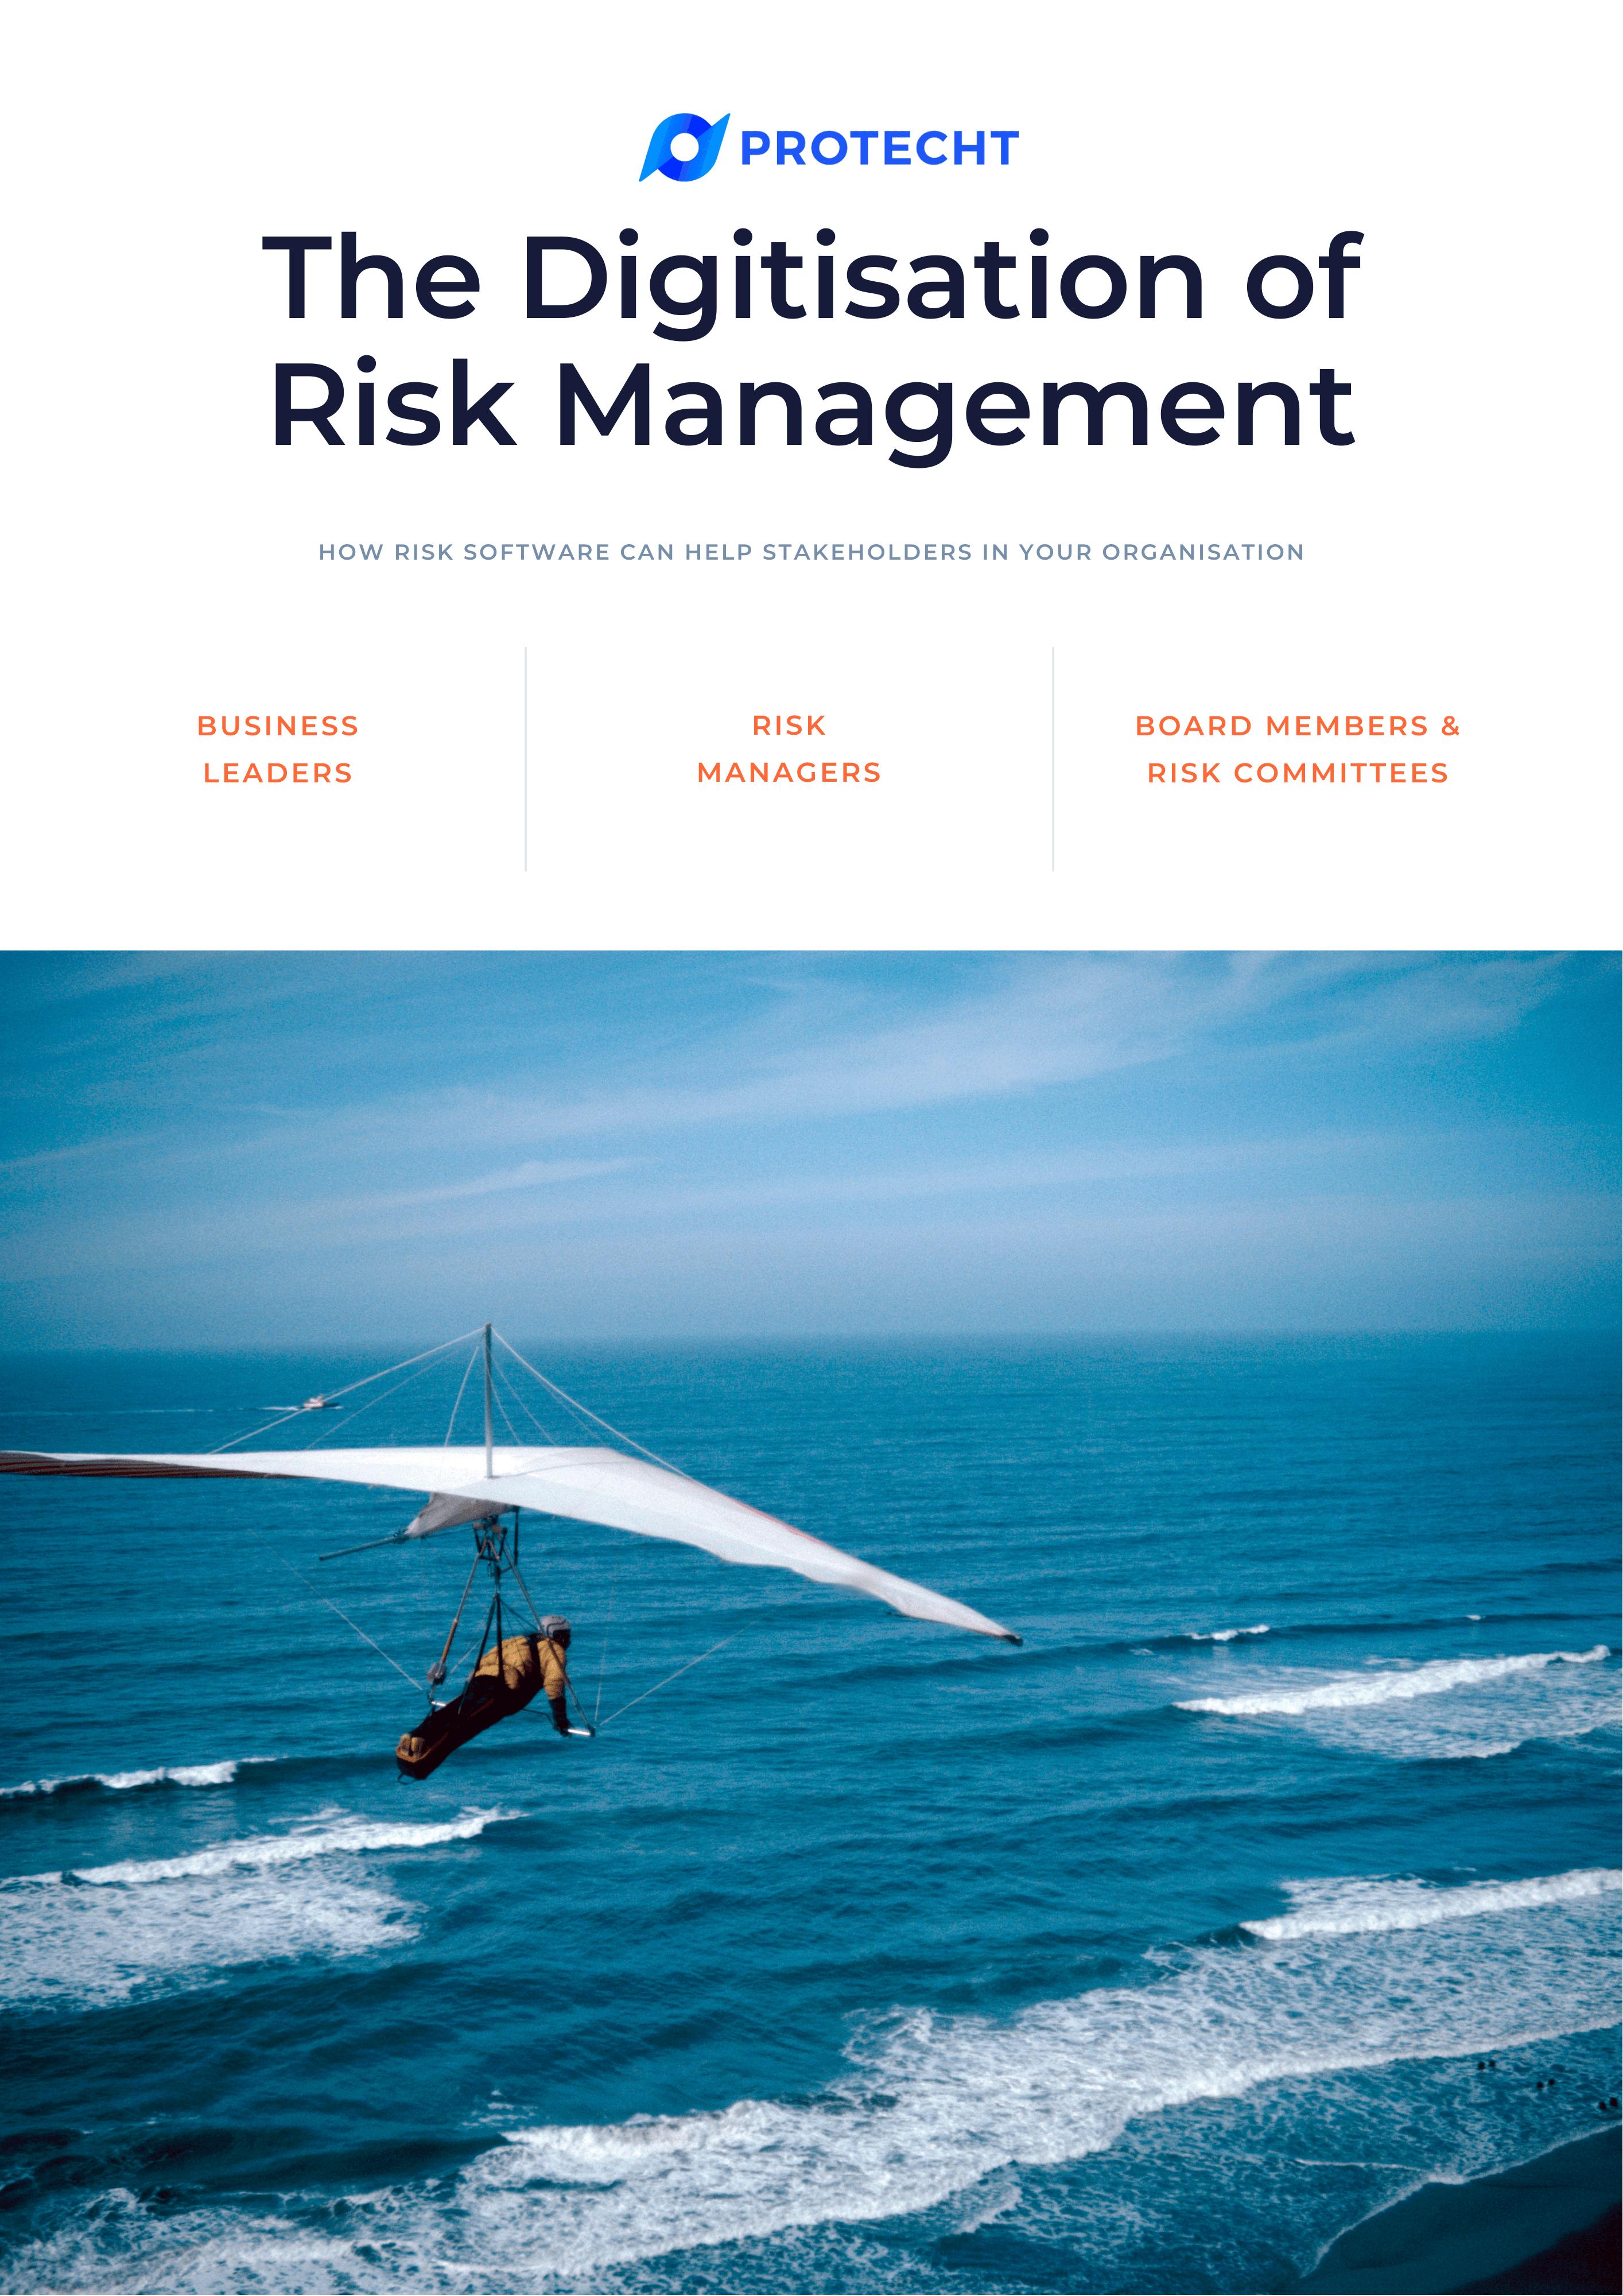 The Digitisation of Risk Management cover